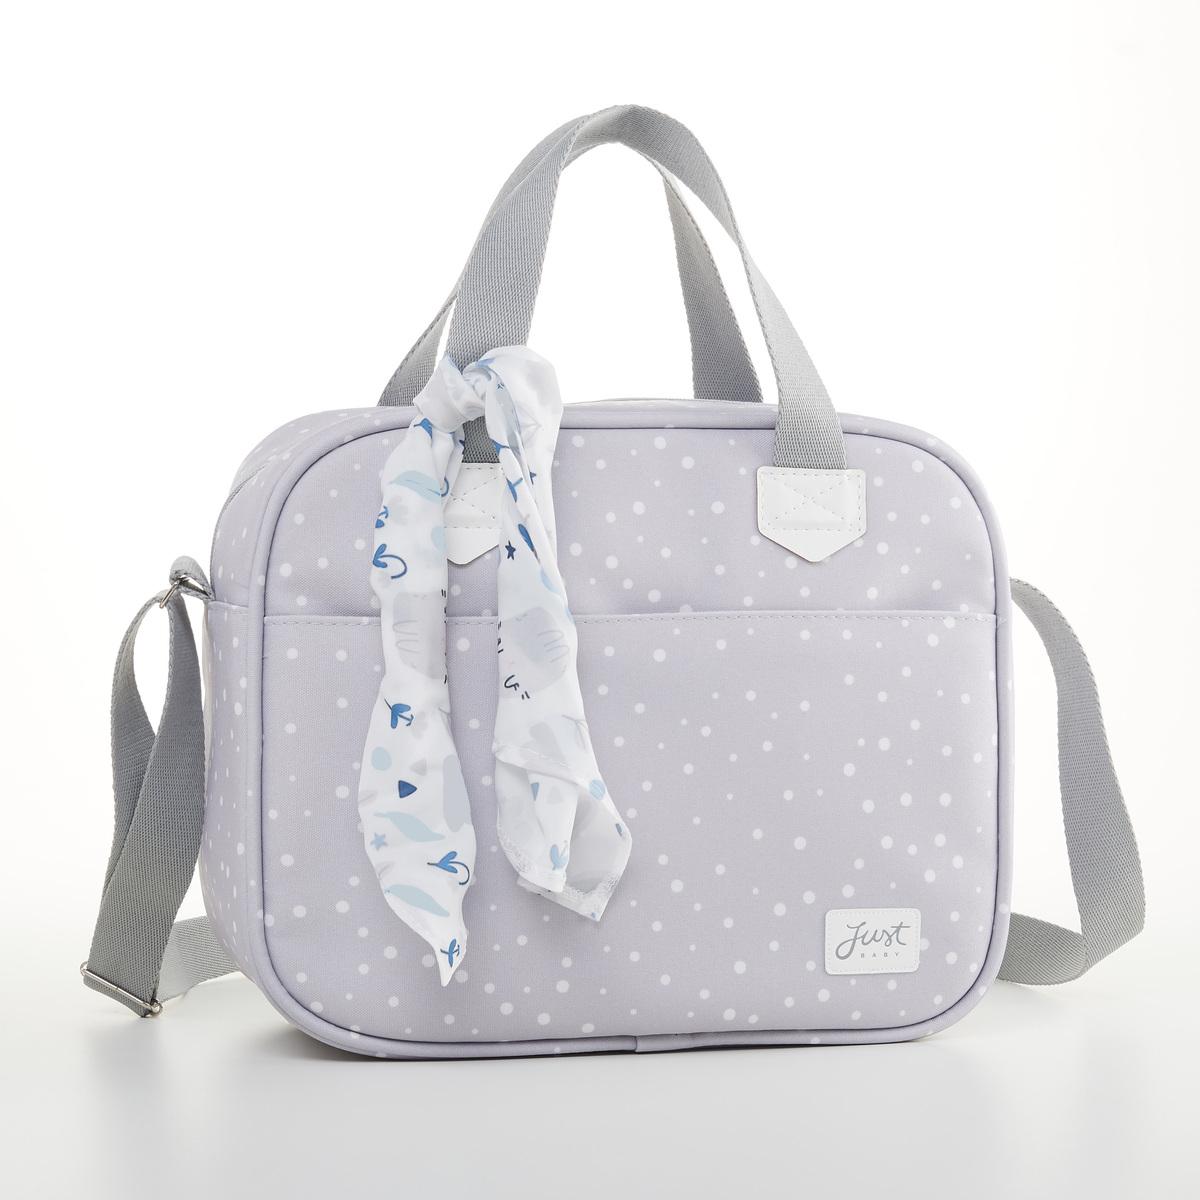 Kit Mala Maternidade + Bolsa Bebê + Frasqueira Térmica Bunny Cinza - Just Baby